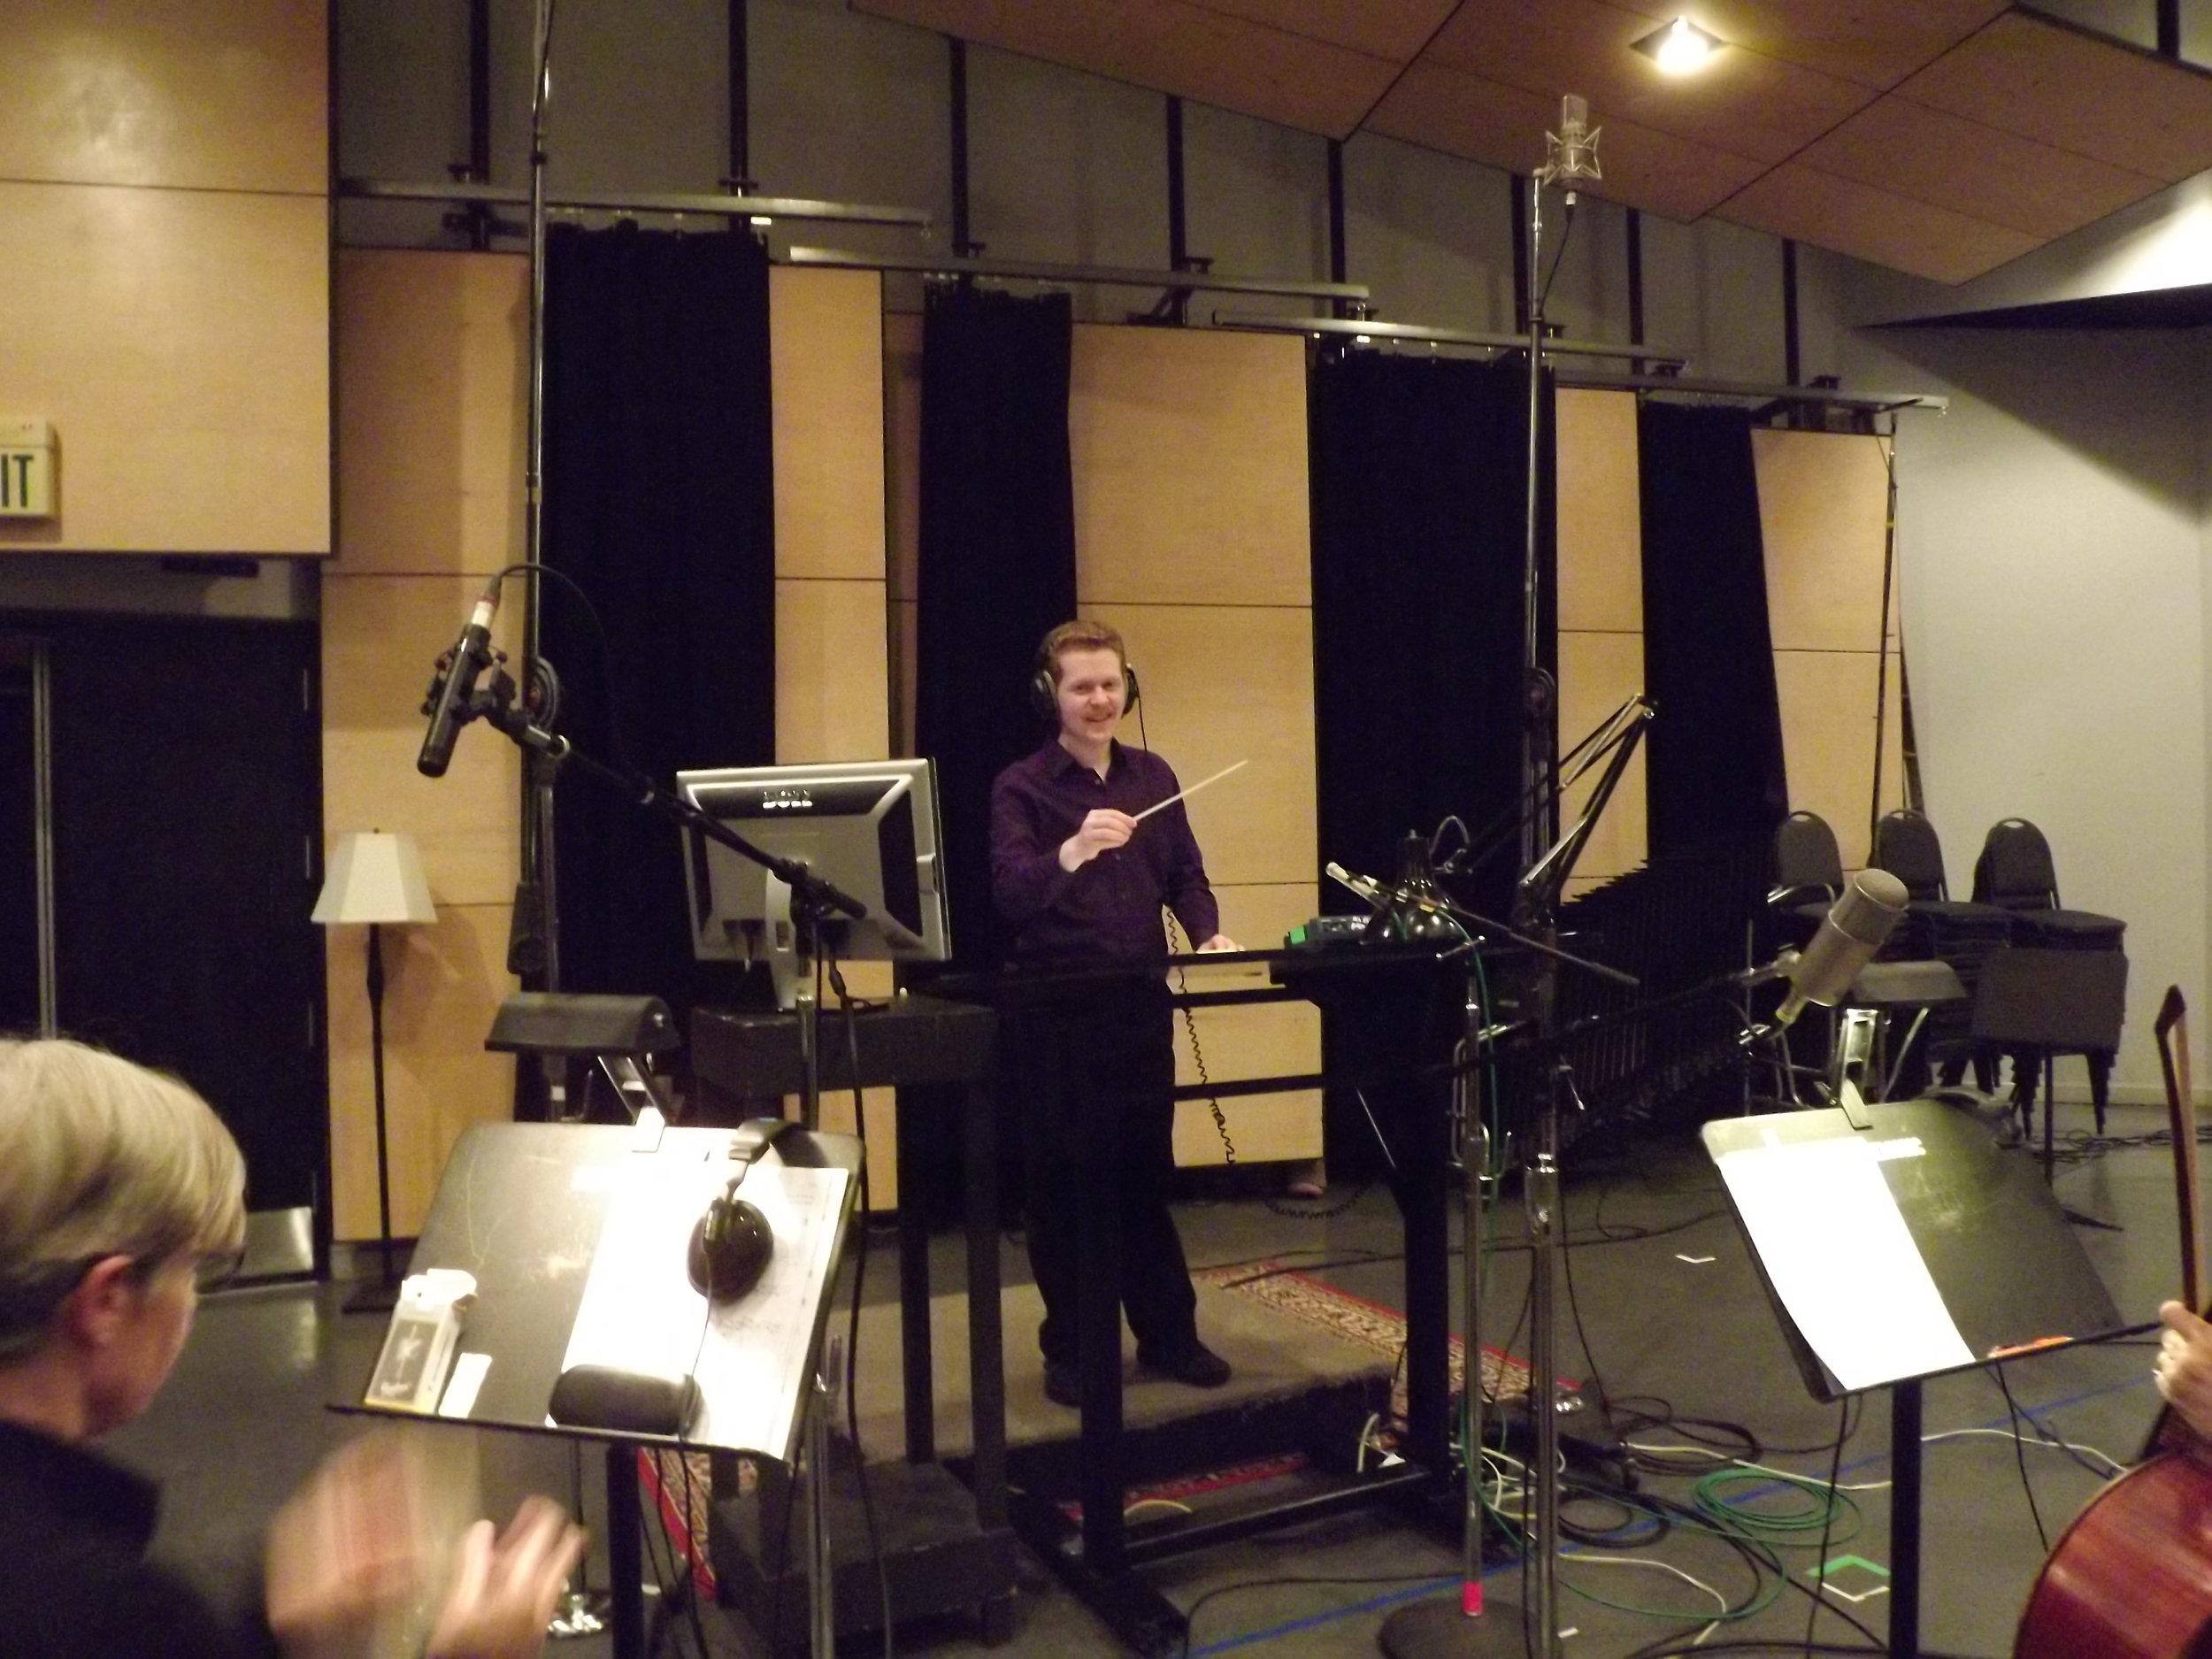 Jacob Conducting Cane at Studio X.JPG